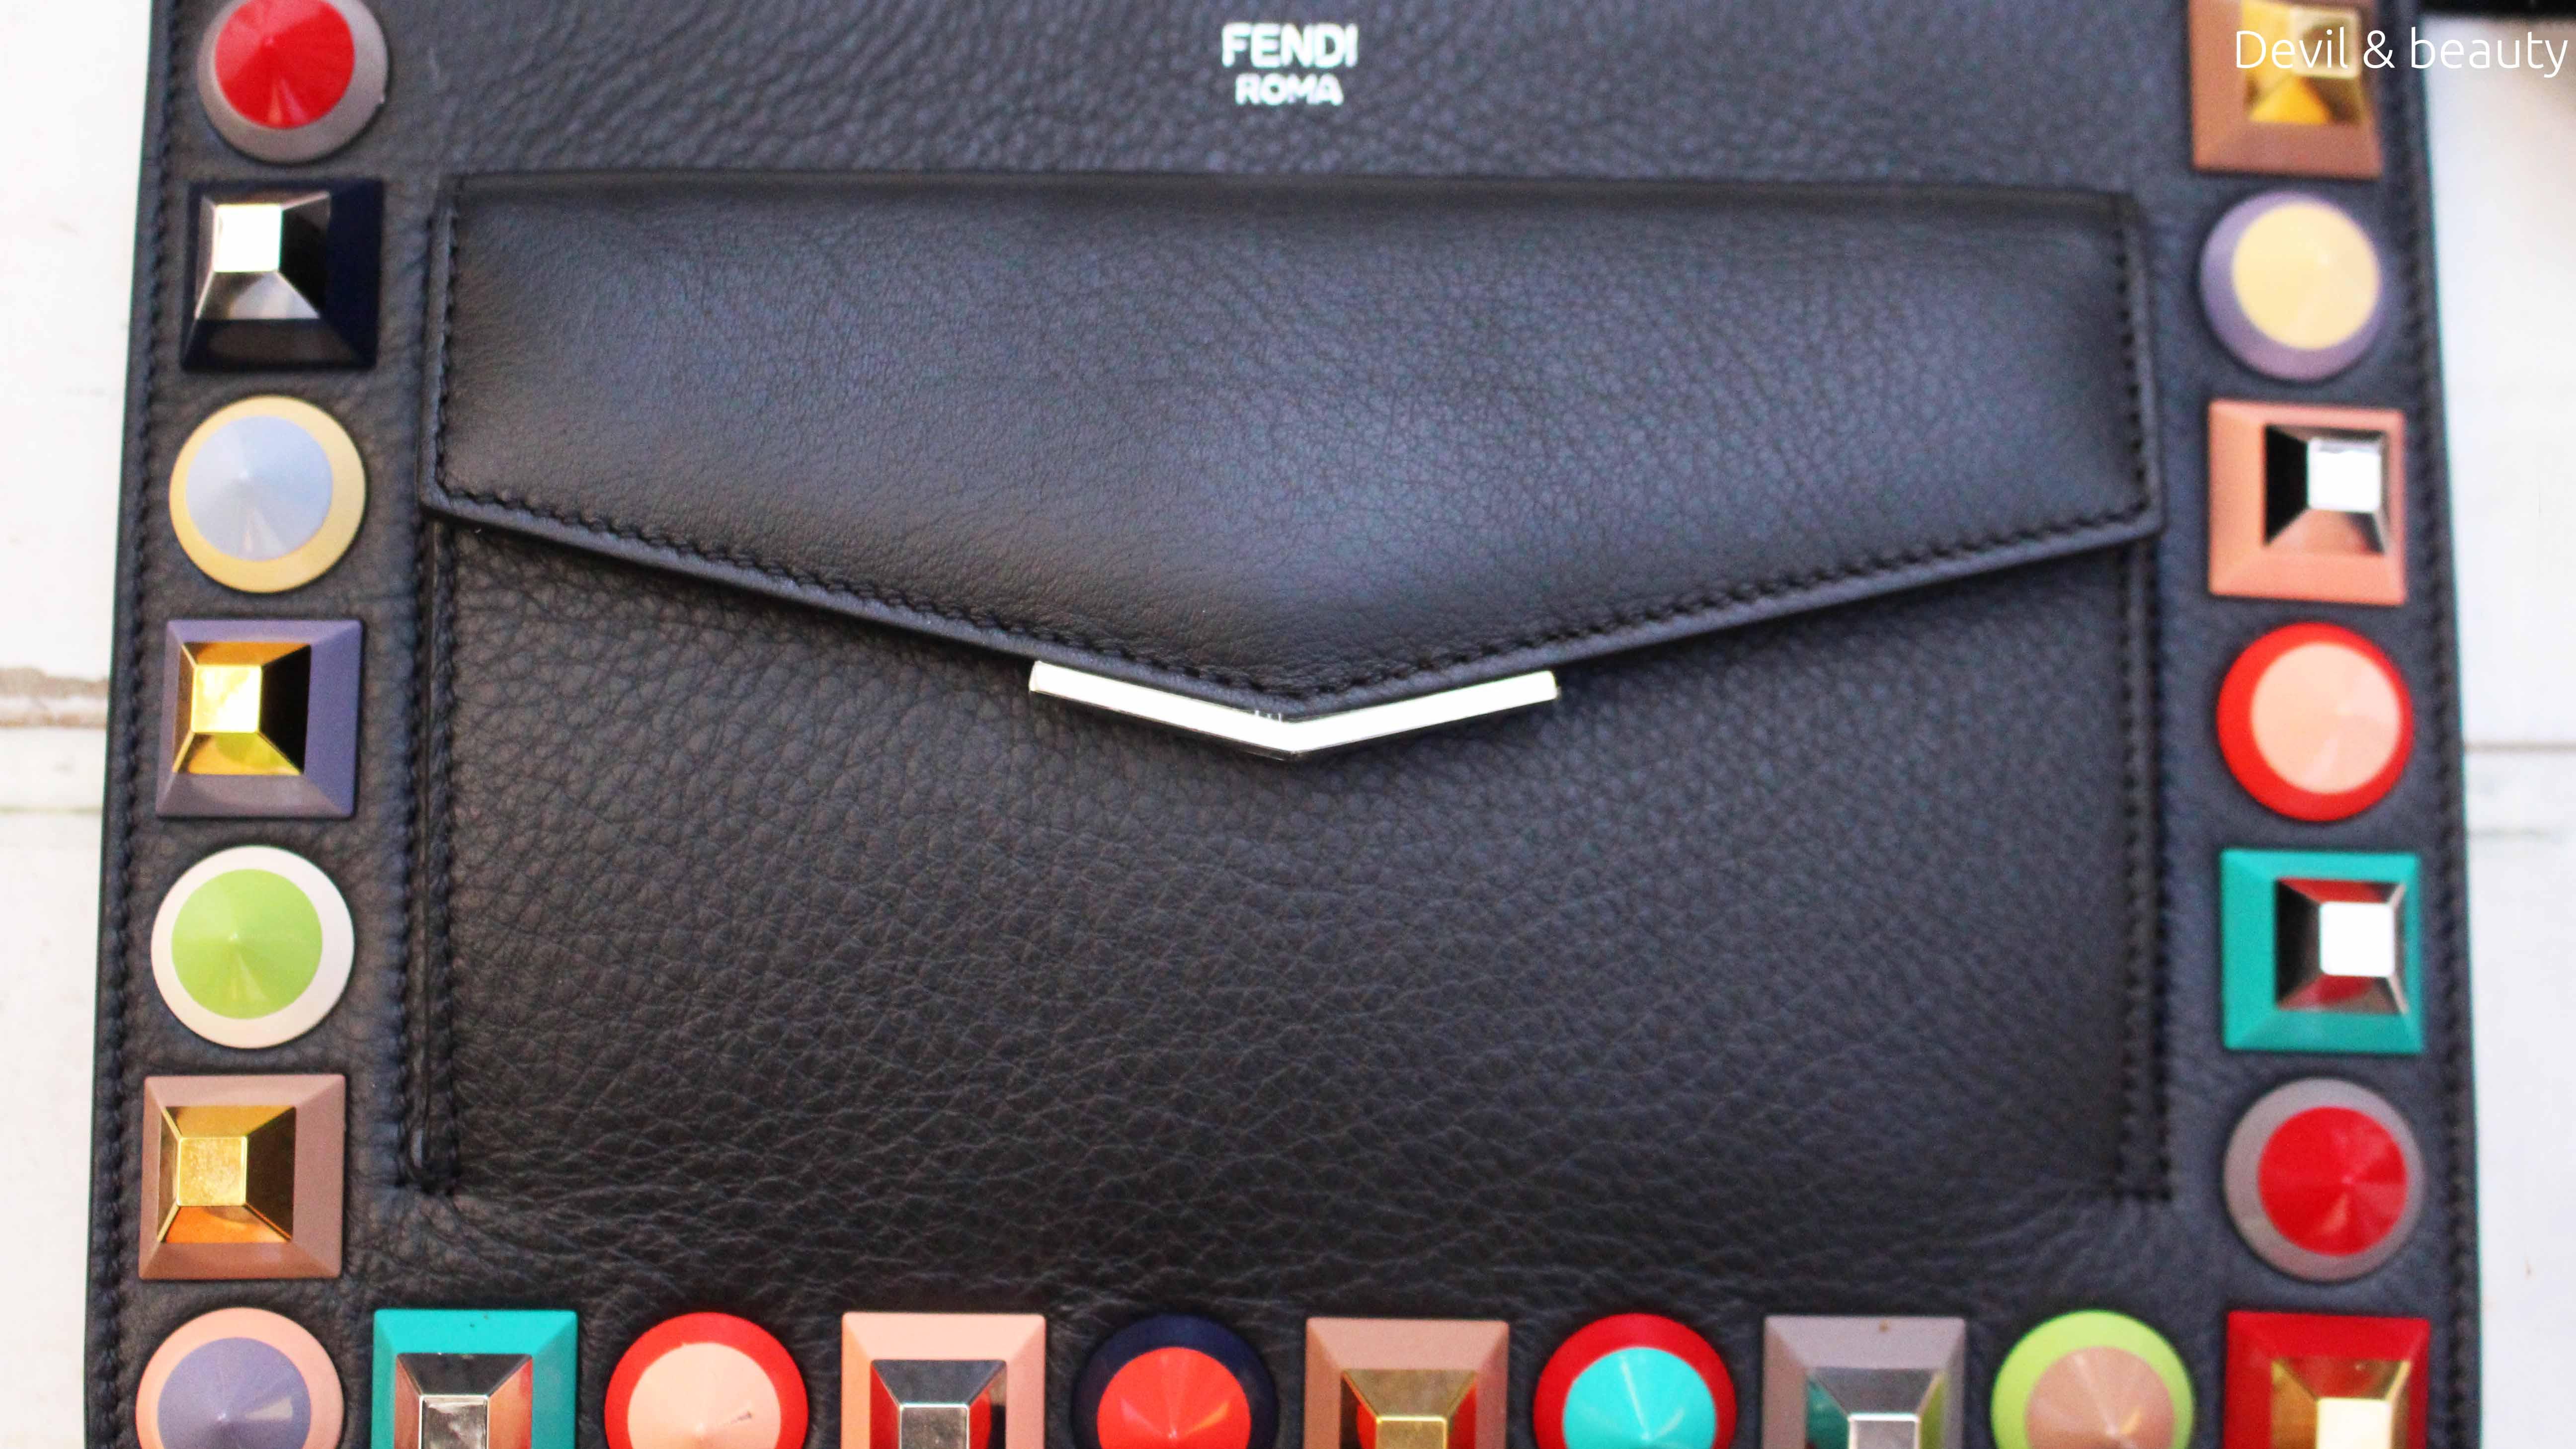 fendi-mini2jours-clutch11 - image